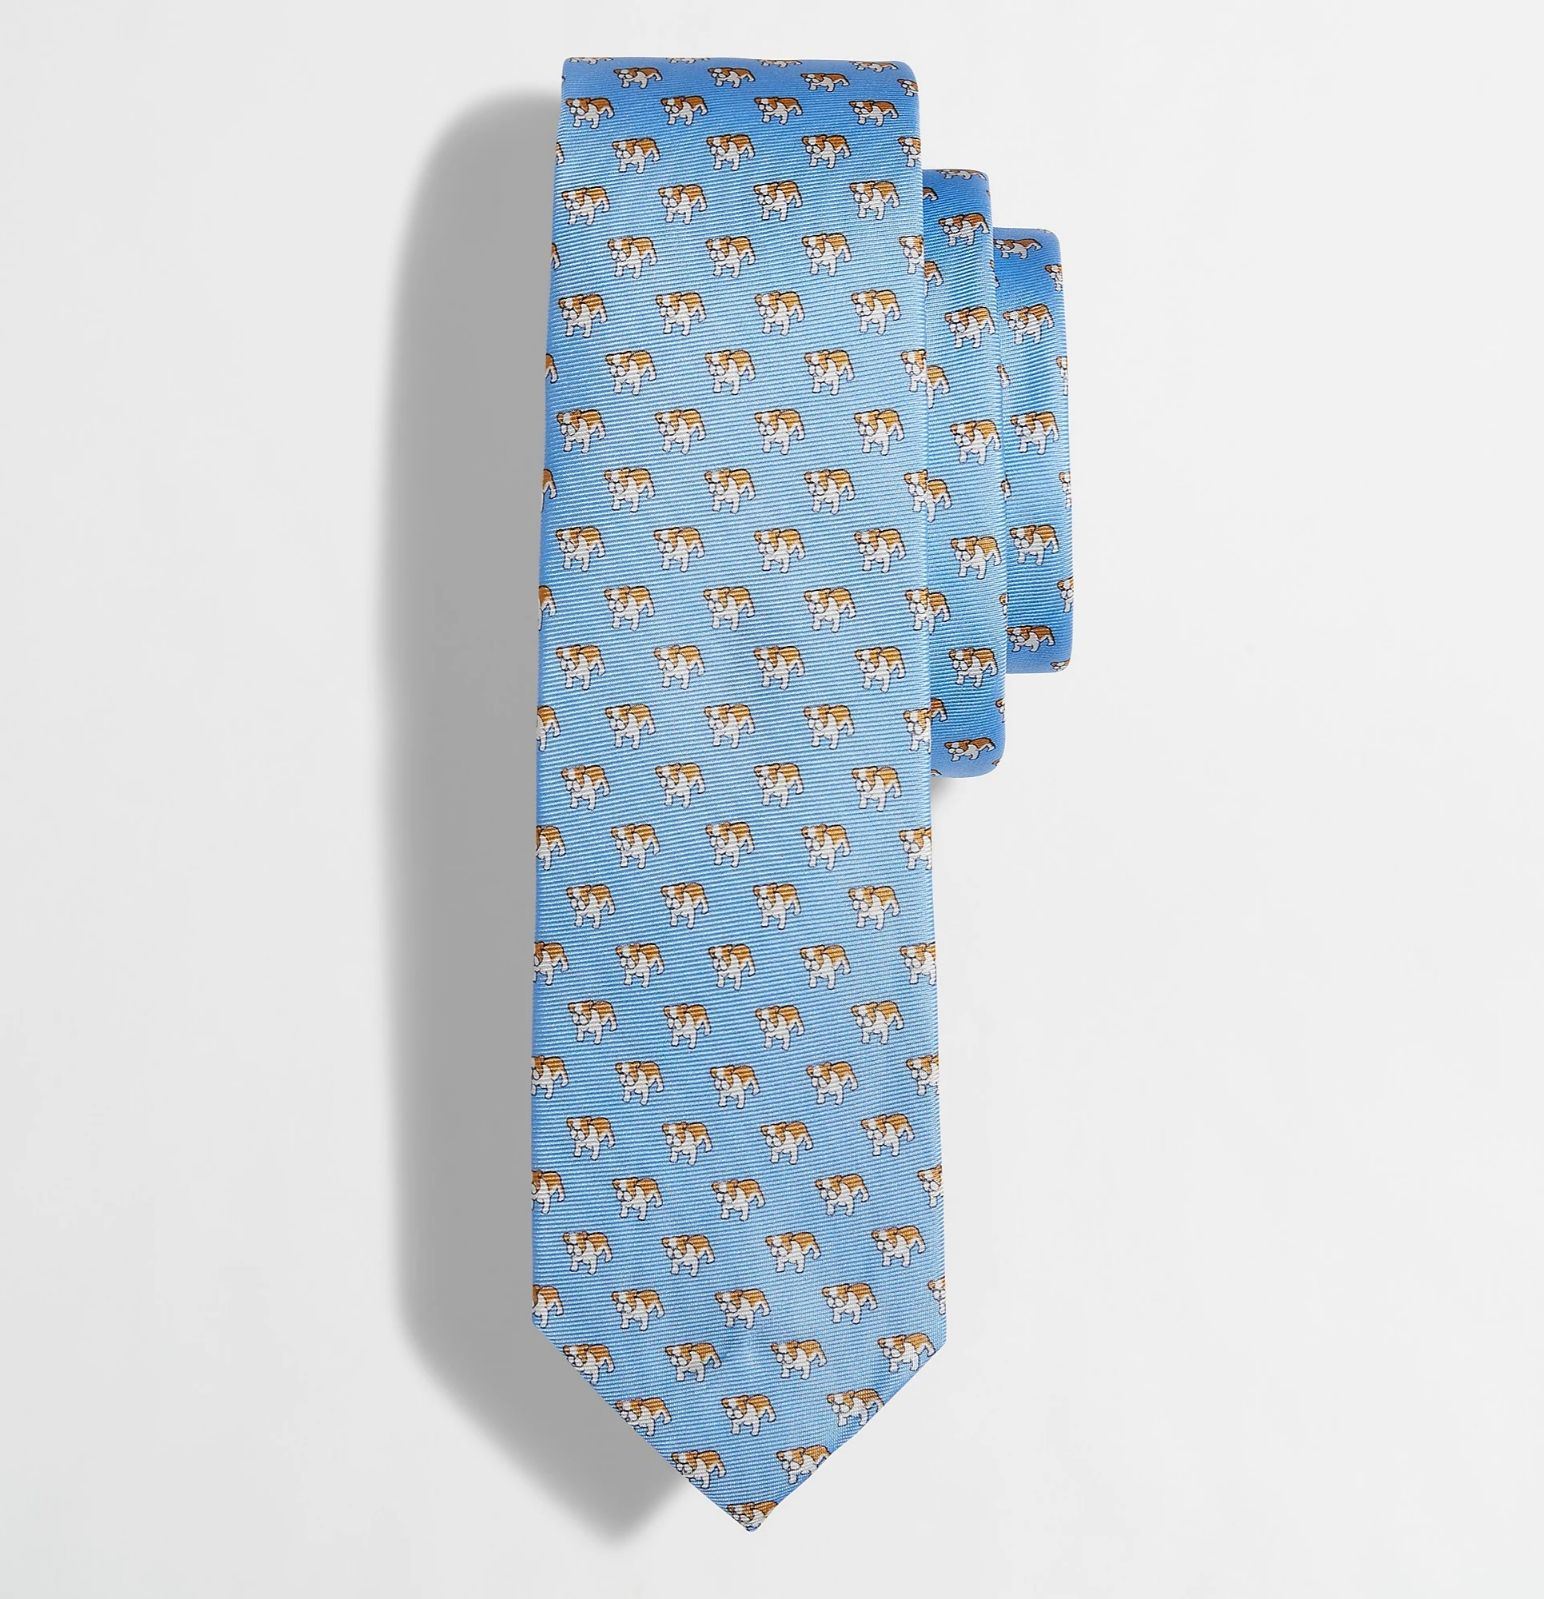 J.Crew - Embroidered Silk Tie